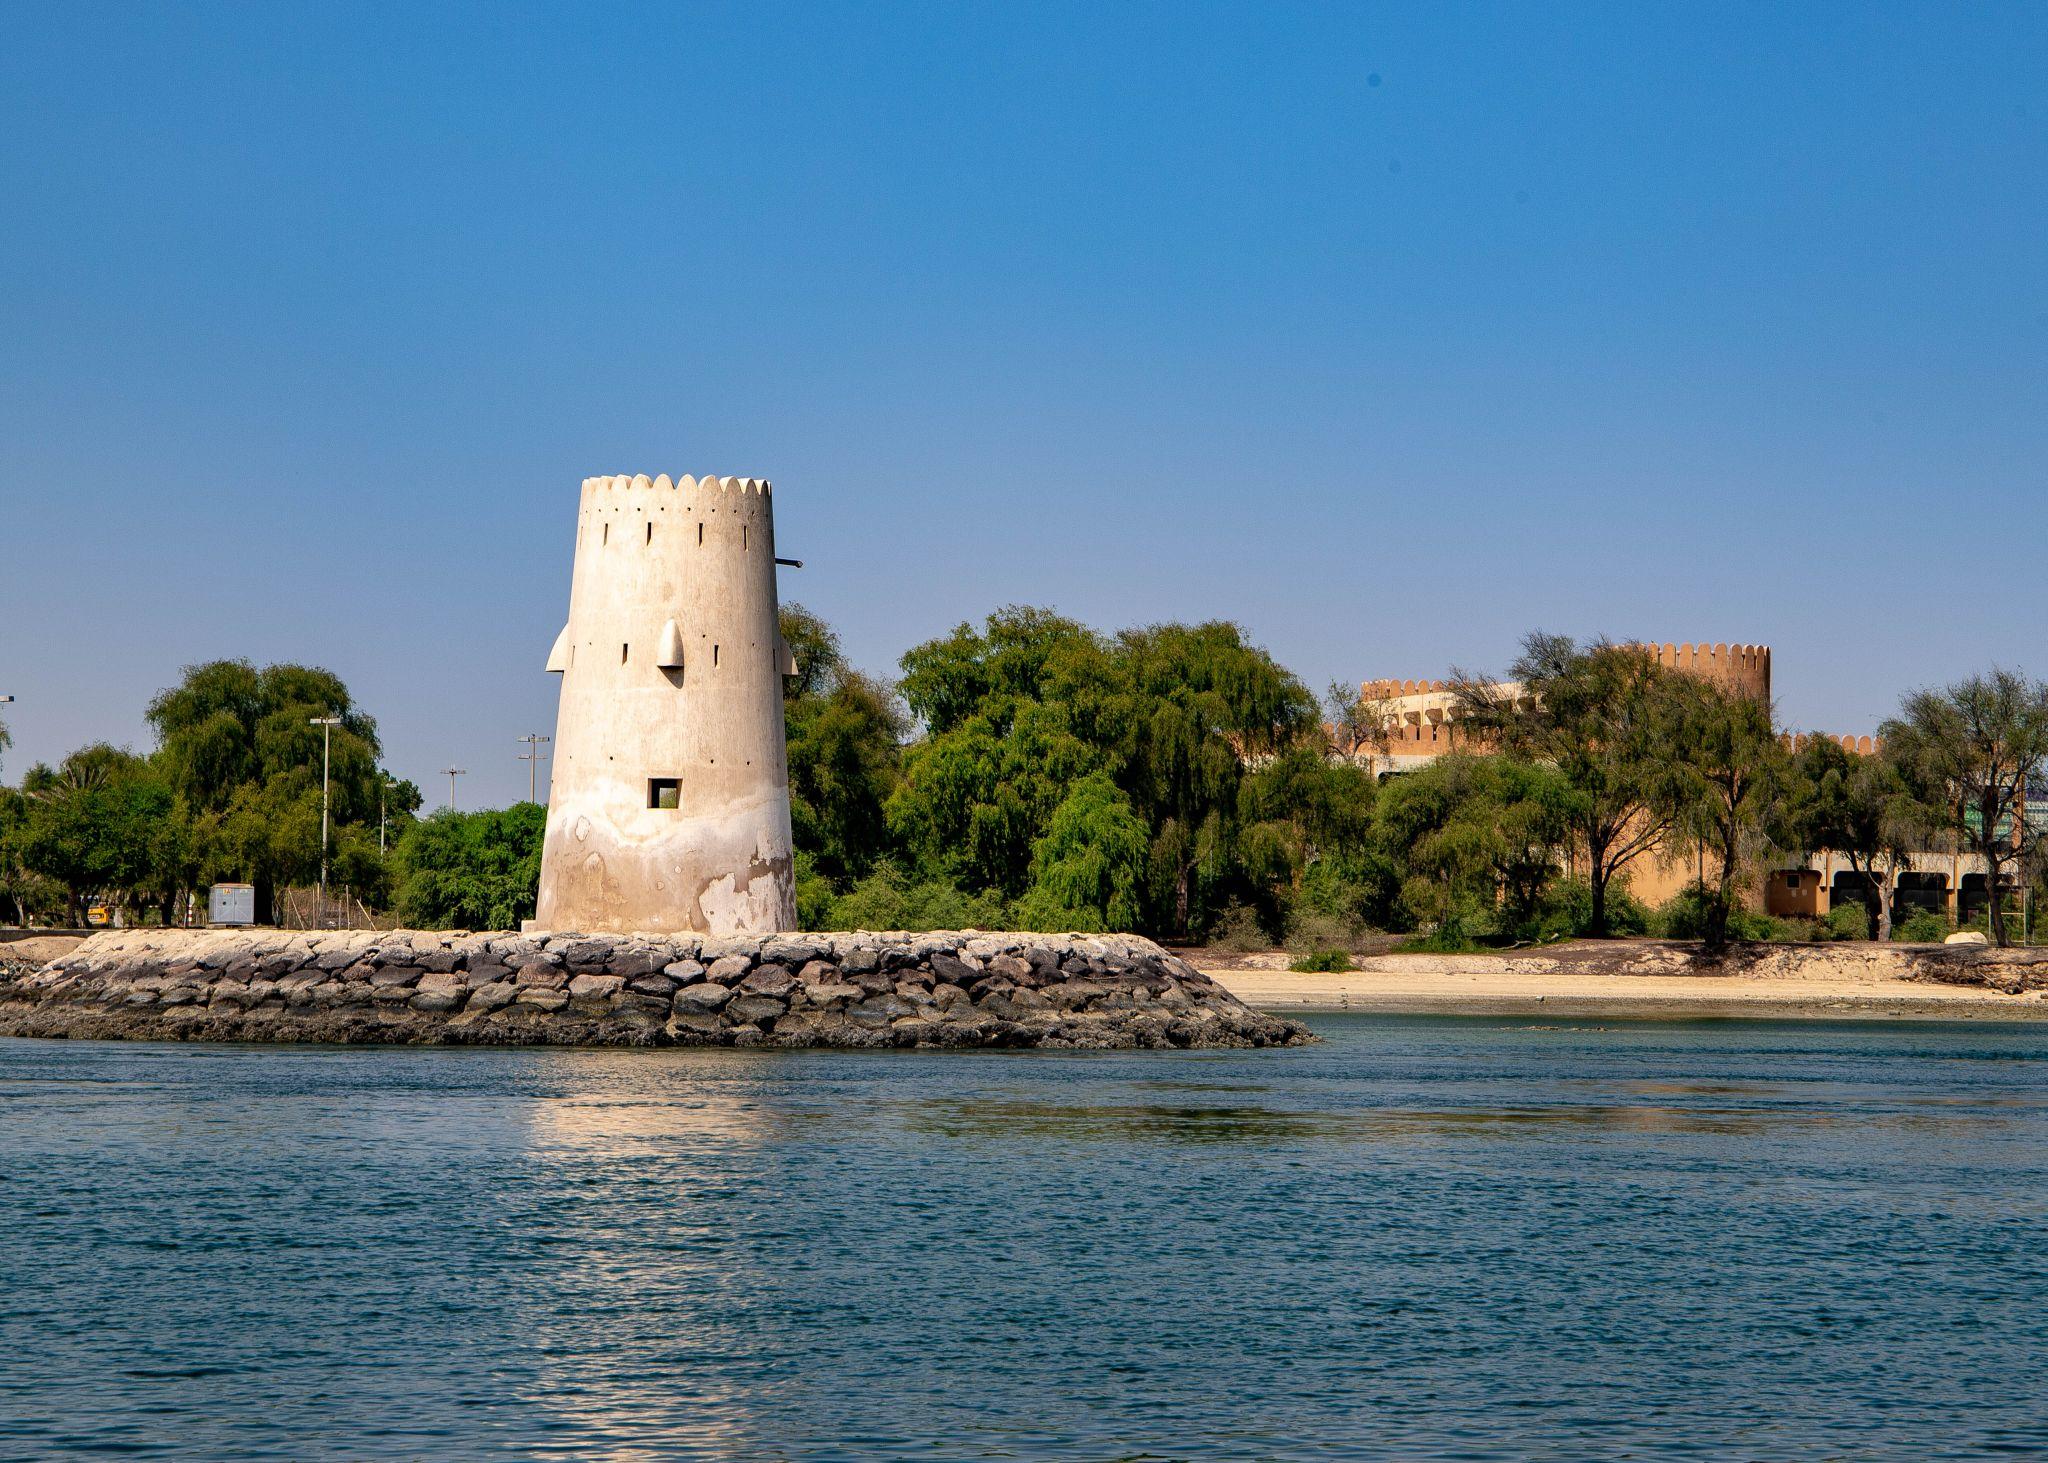 Al Maqta Fort and Tower, United Arab Emirates